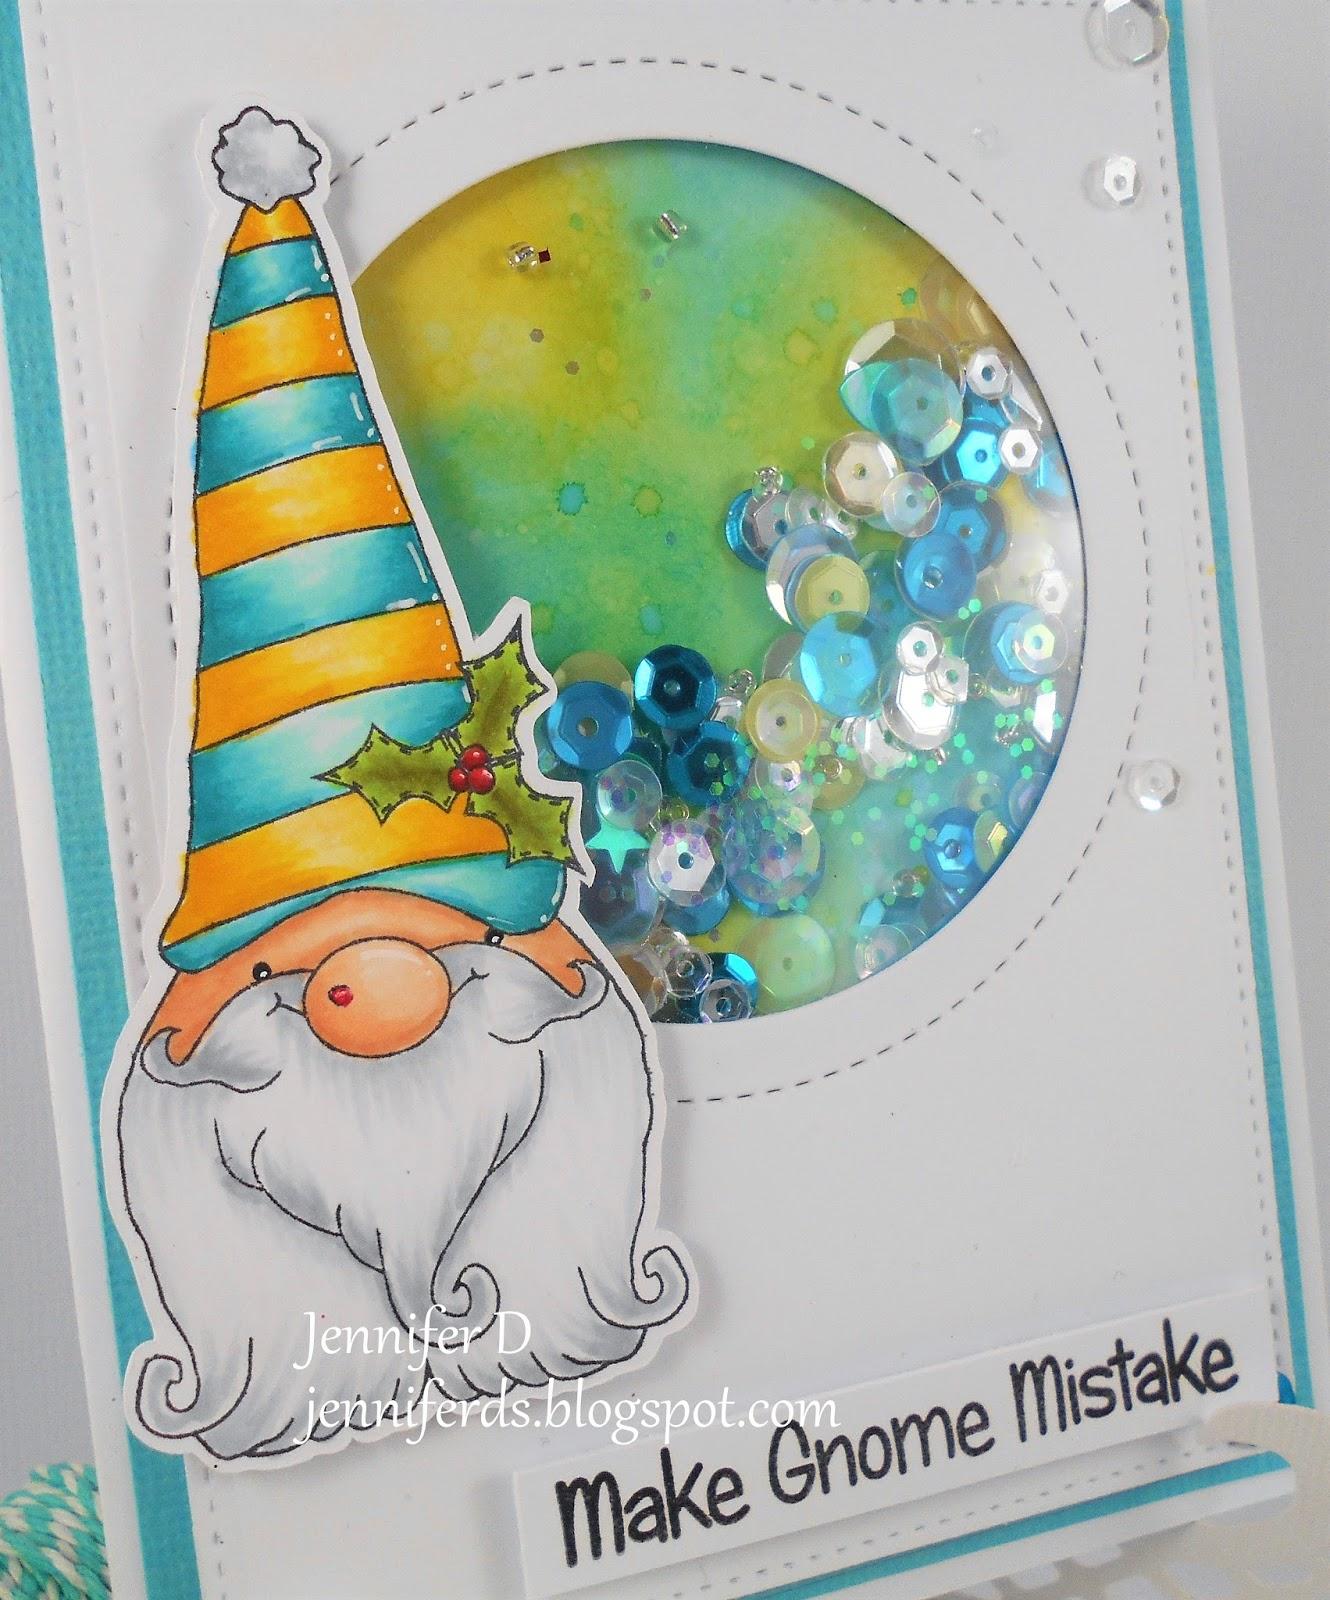 JenniferD's Blog: Make Gnome Mistake